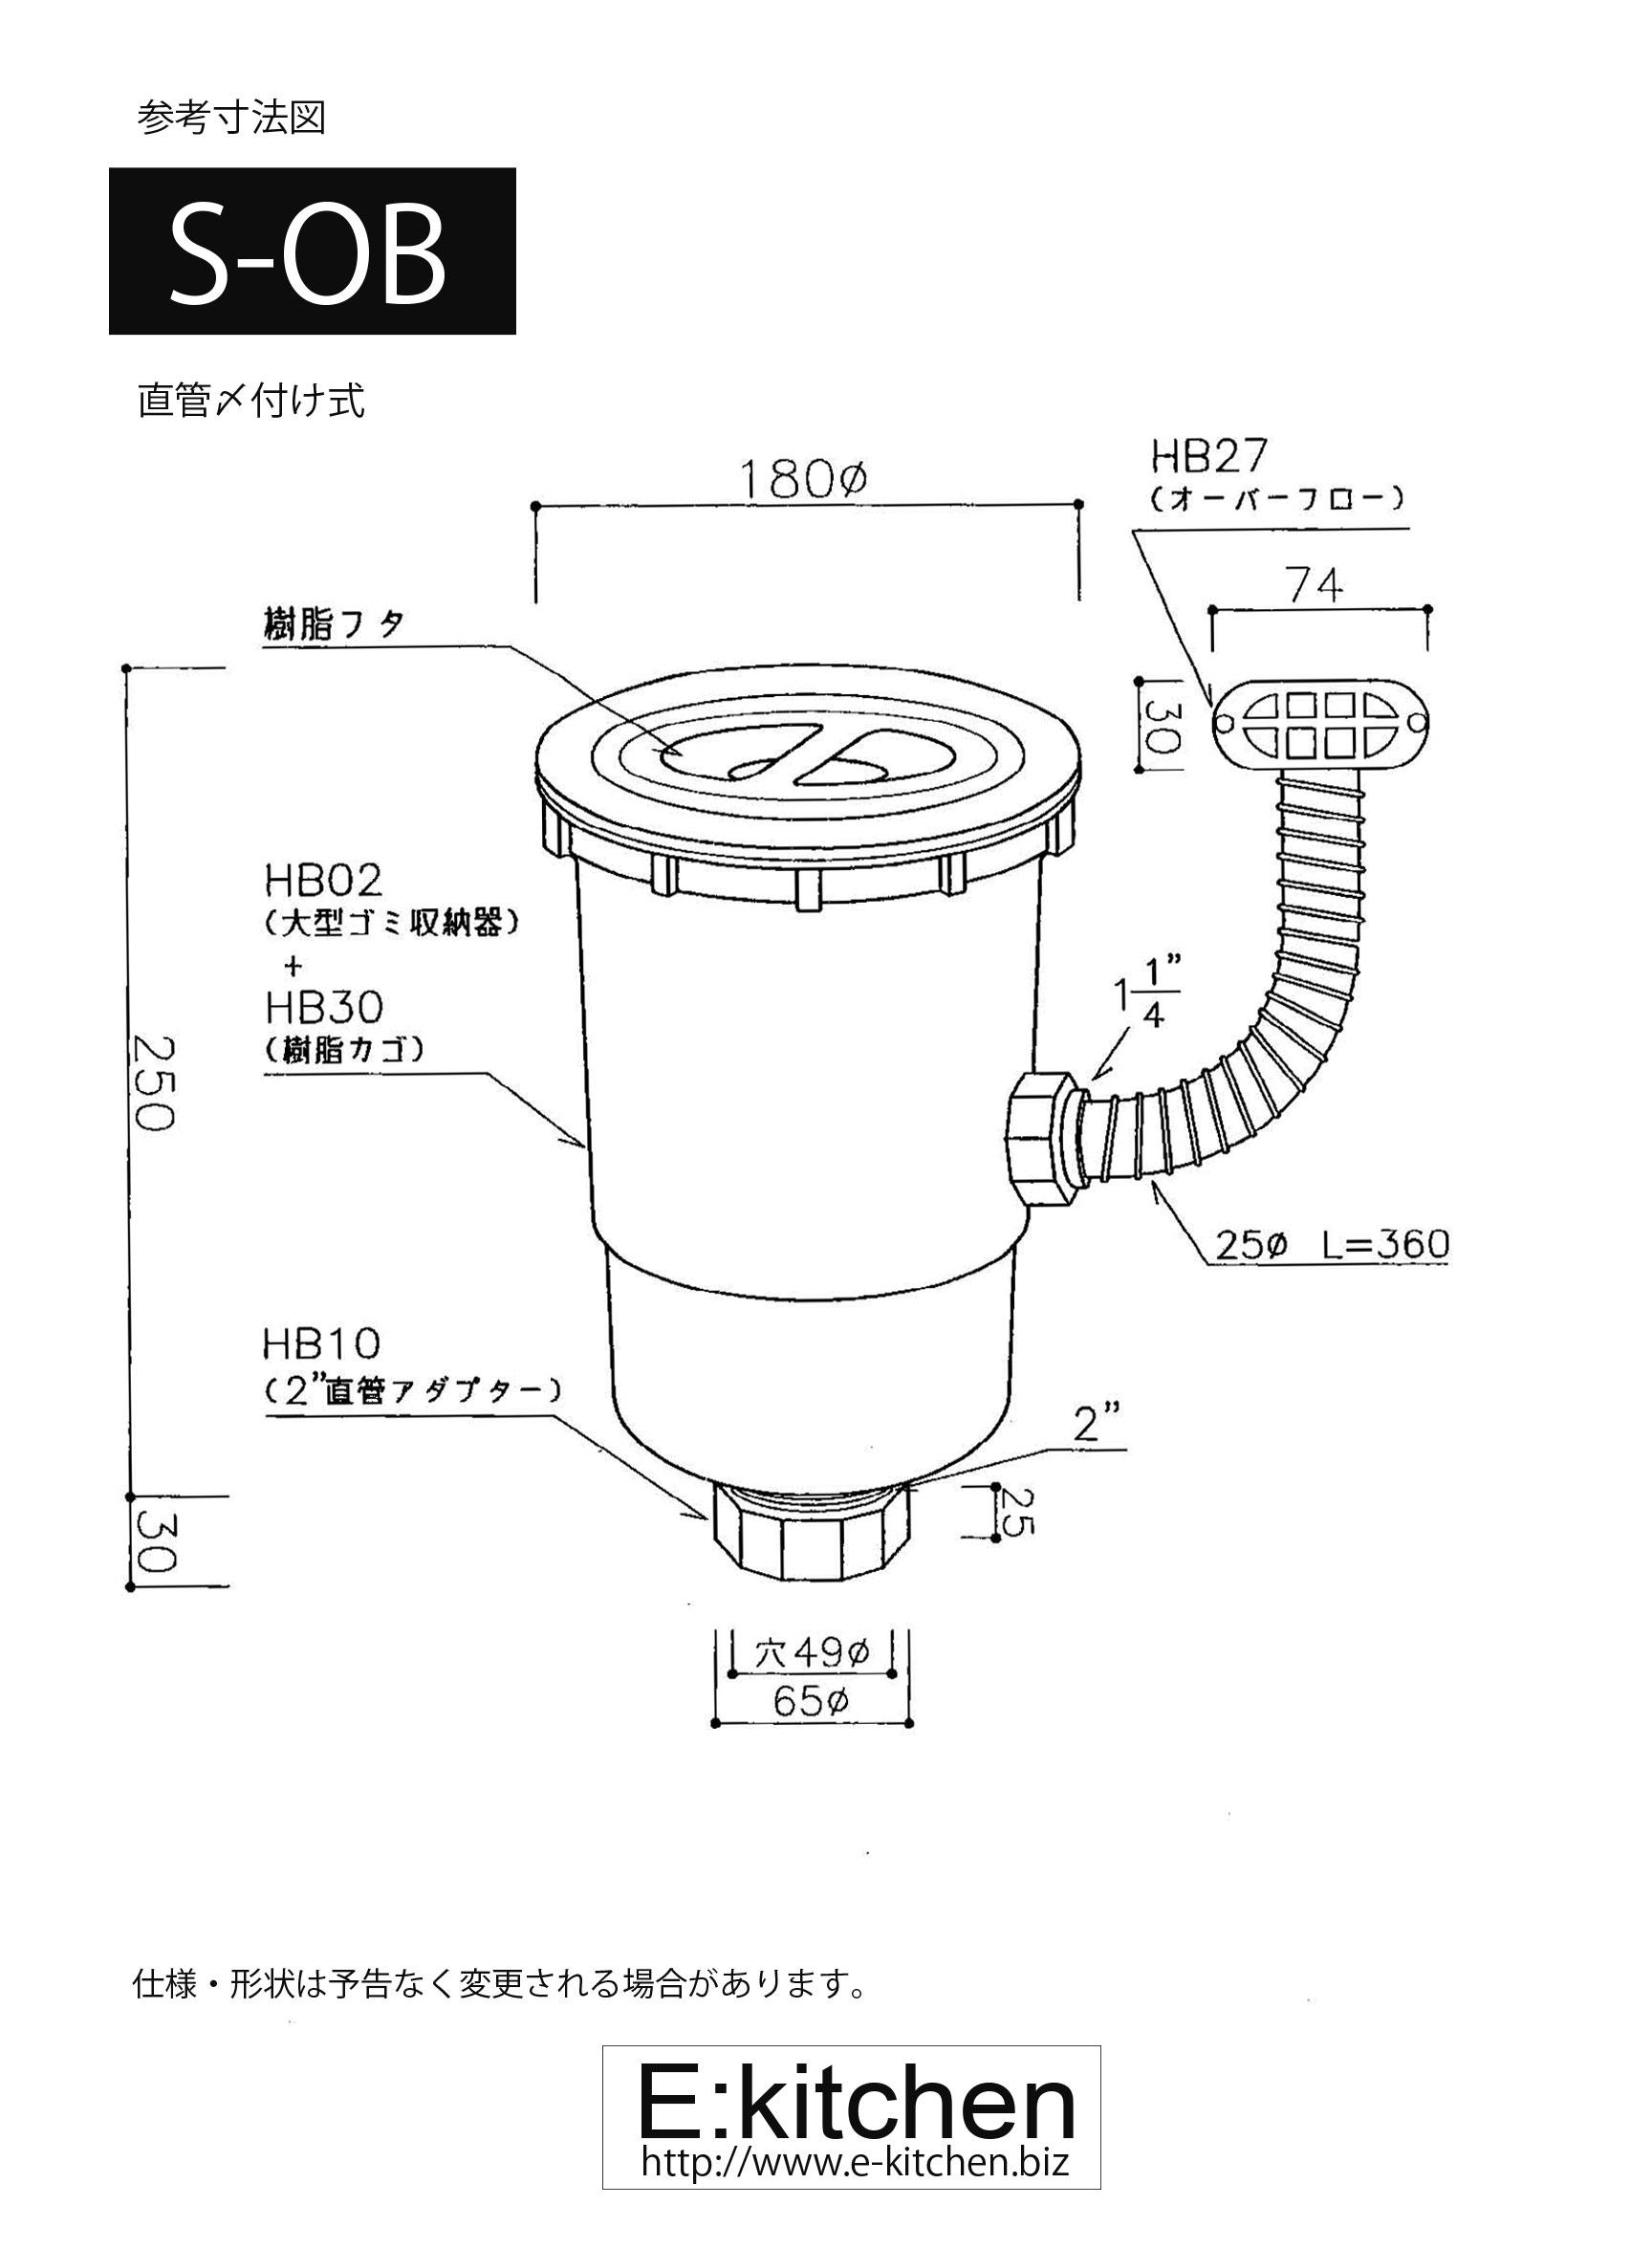 CKシリーズ 排水部品S-OB